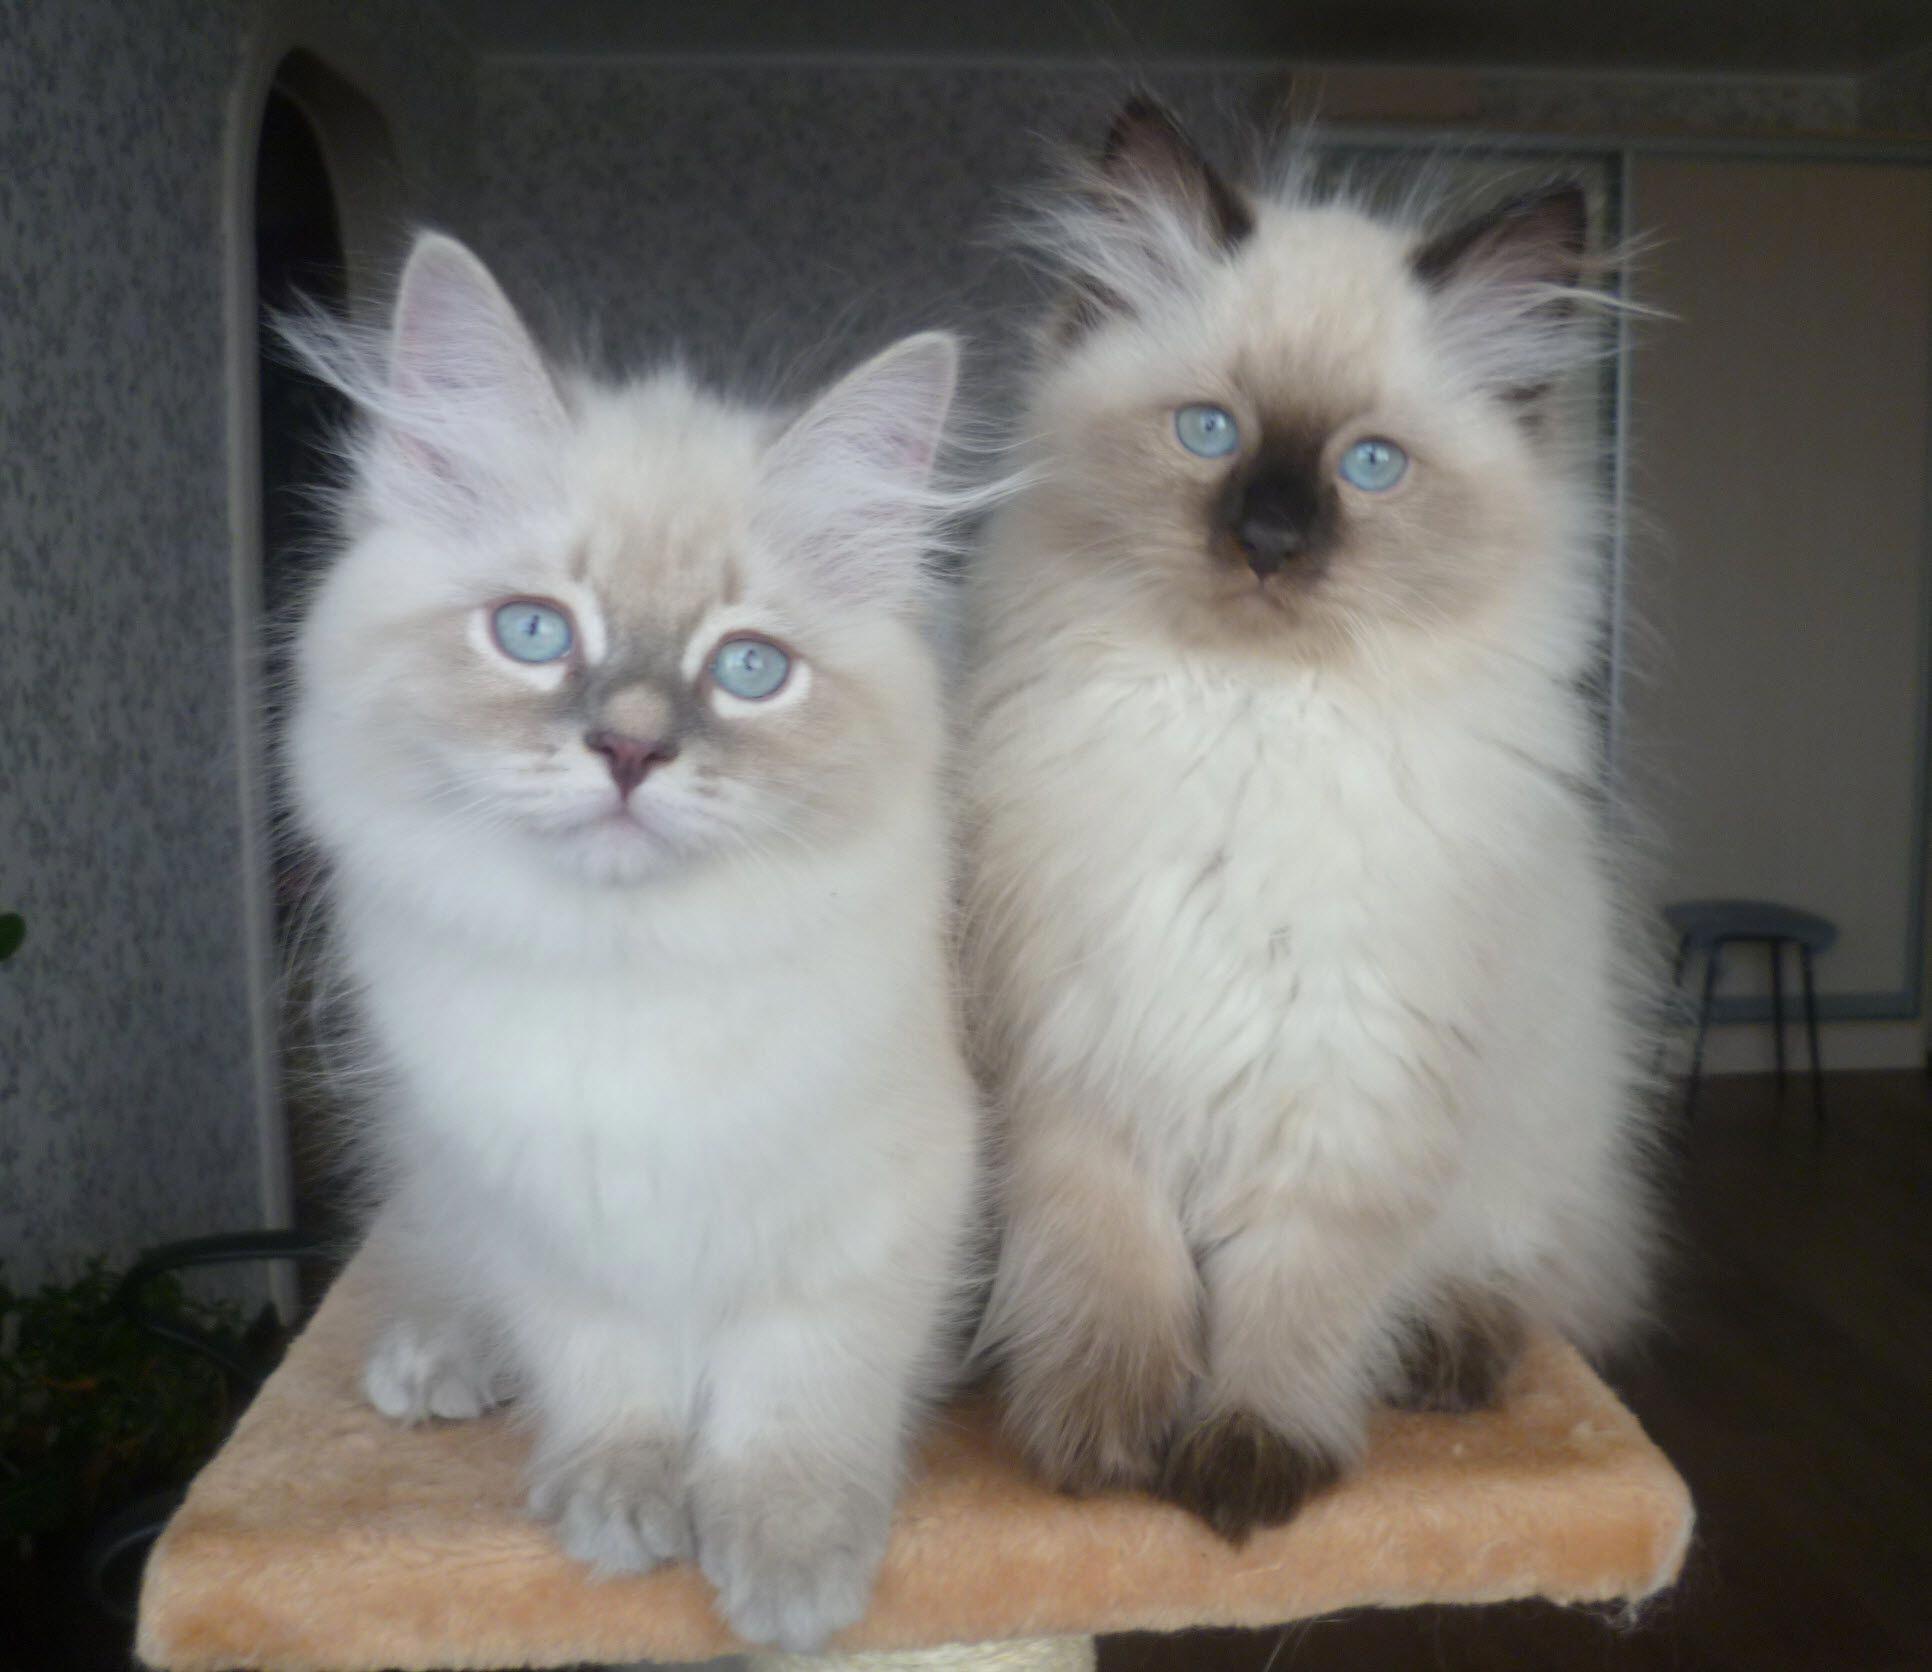 Cats for sale near me whycatspurr shelvesforcats